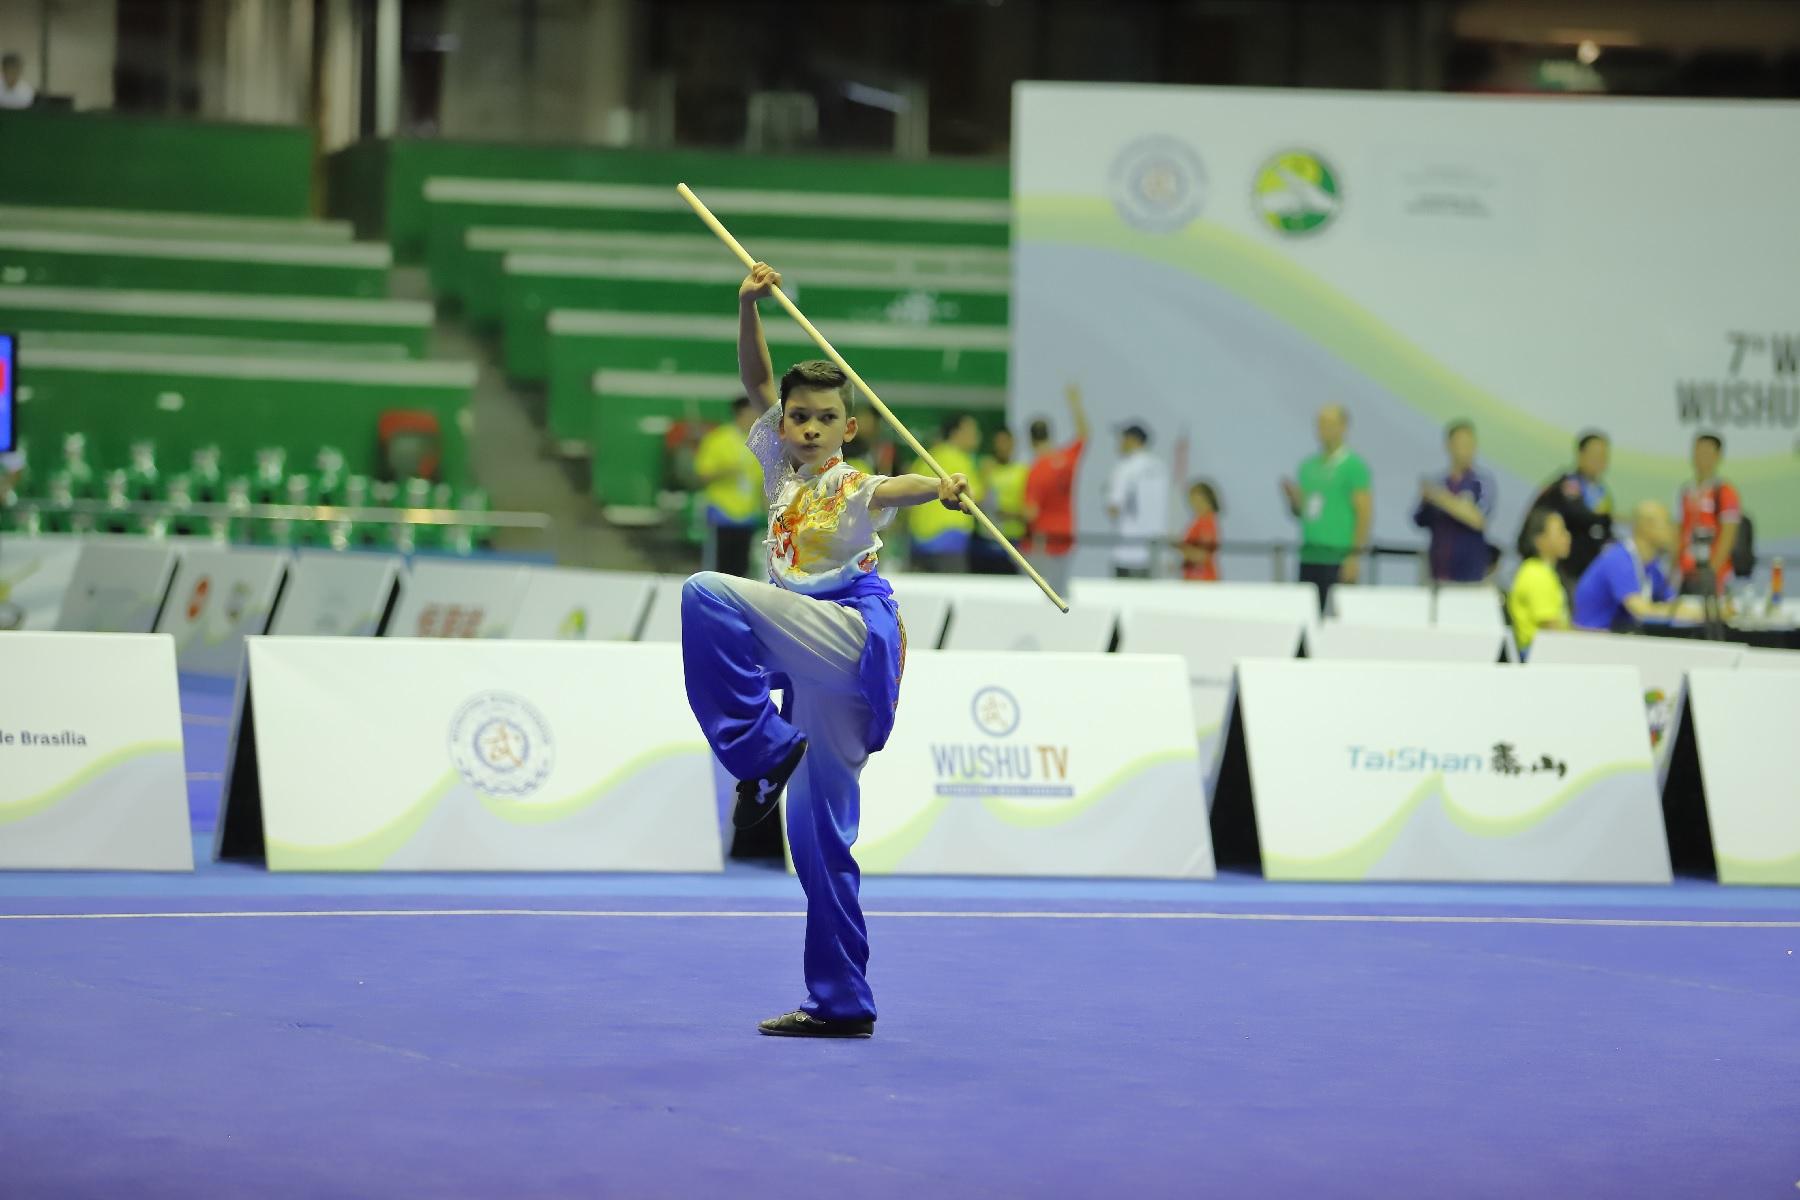 wayland-li-wushu-brazil-world-junior-wushu-championships-2018-team-canada-06.jpg